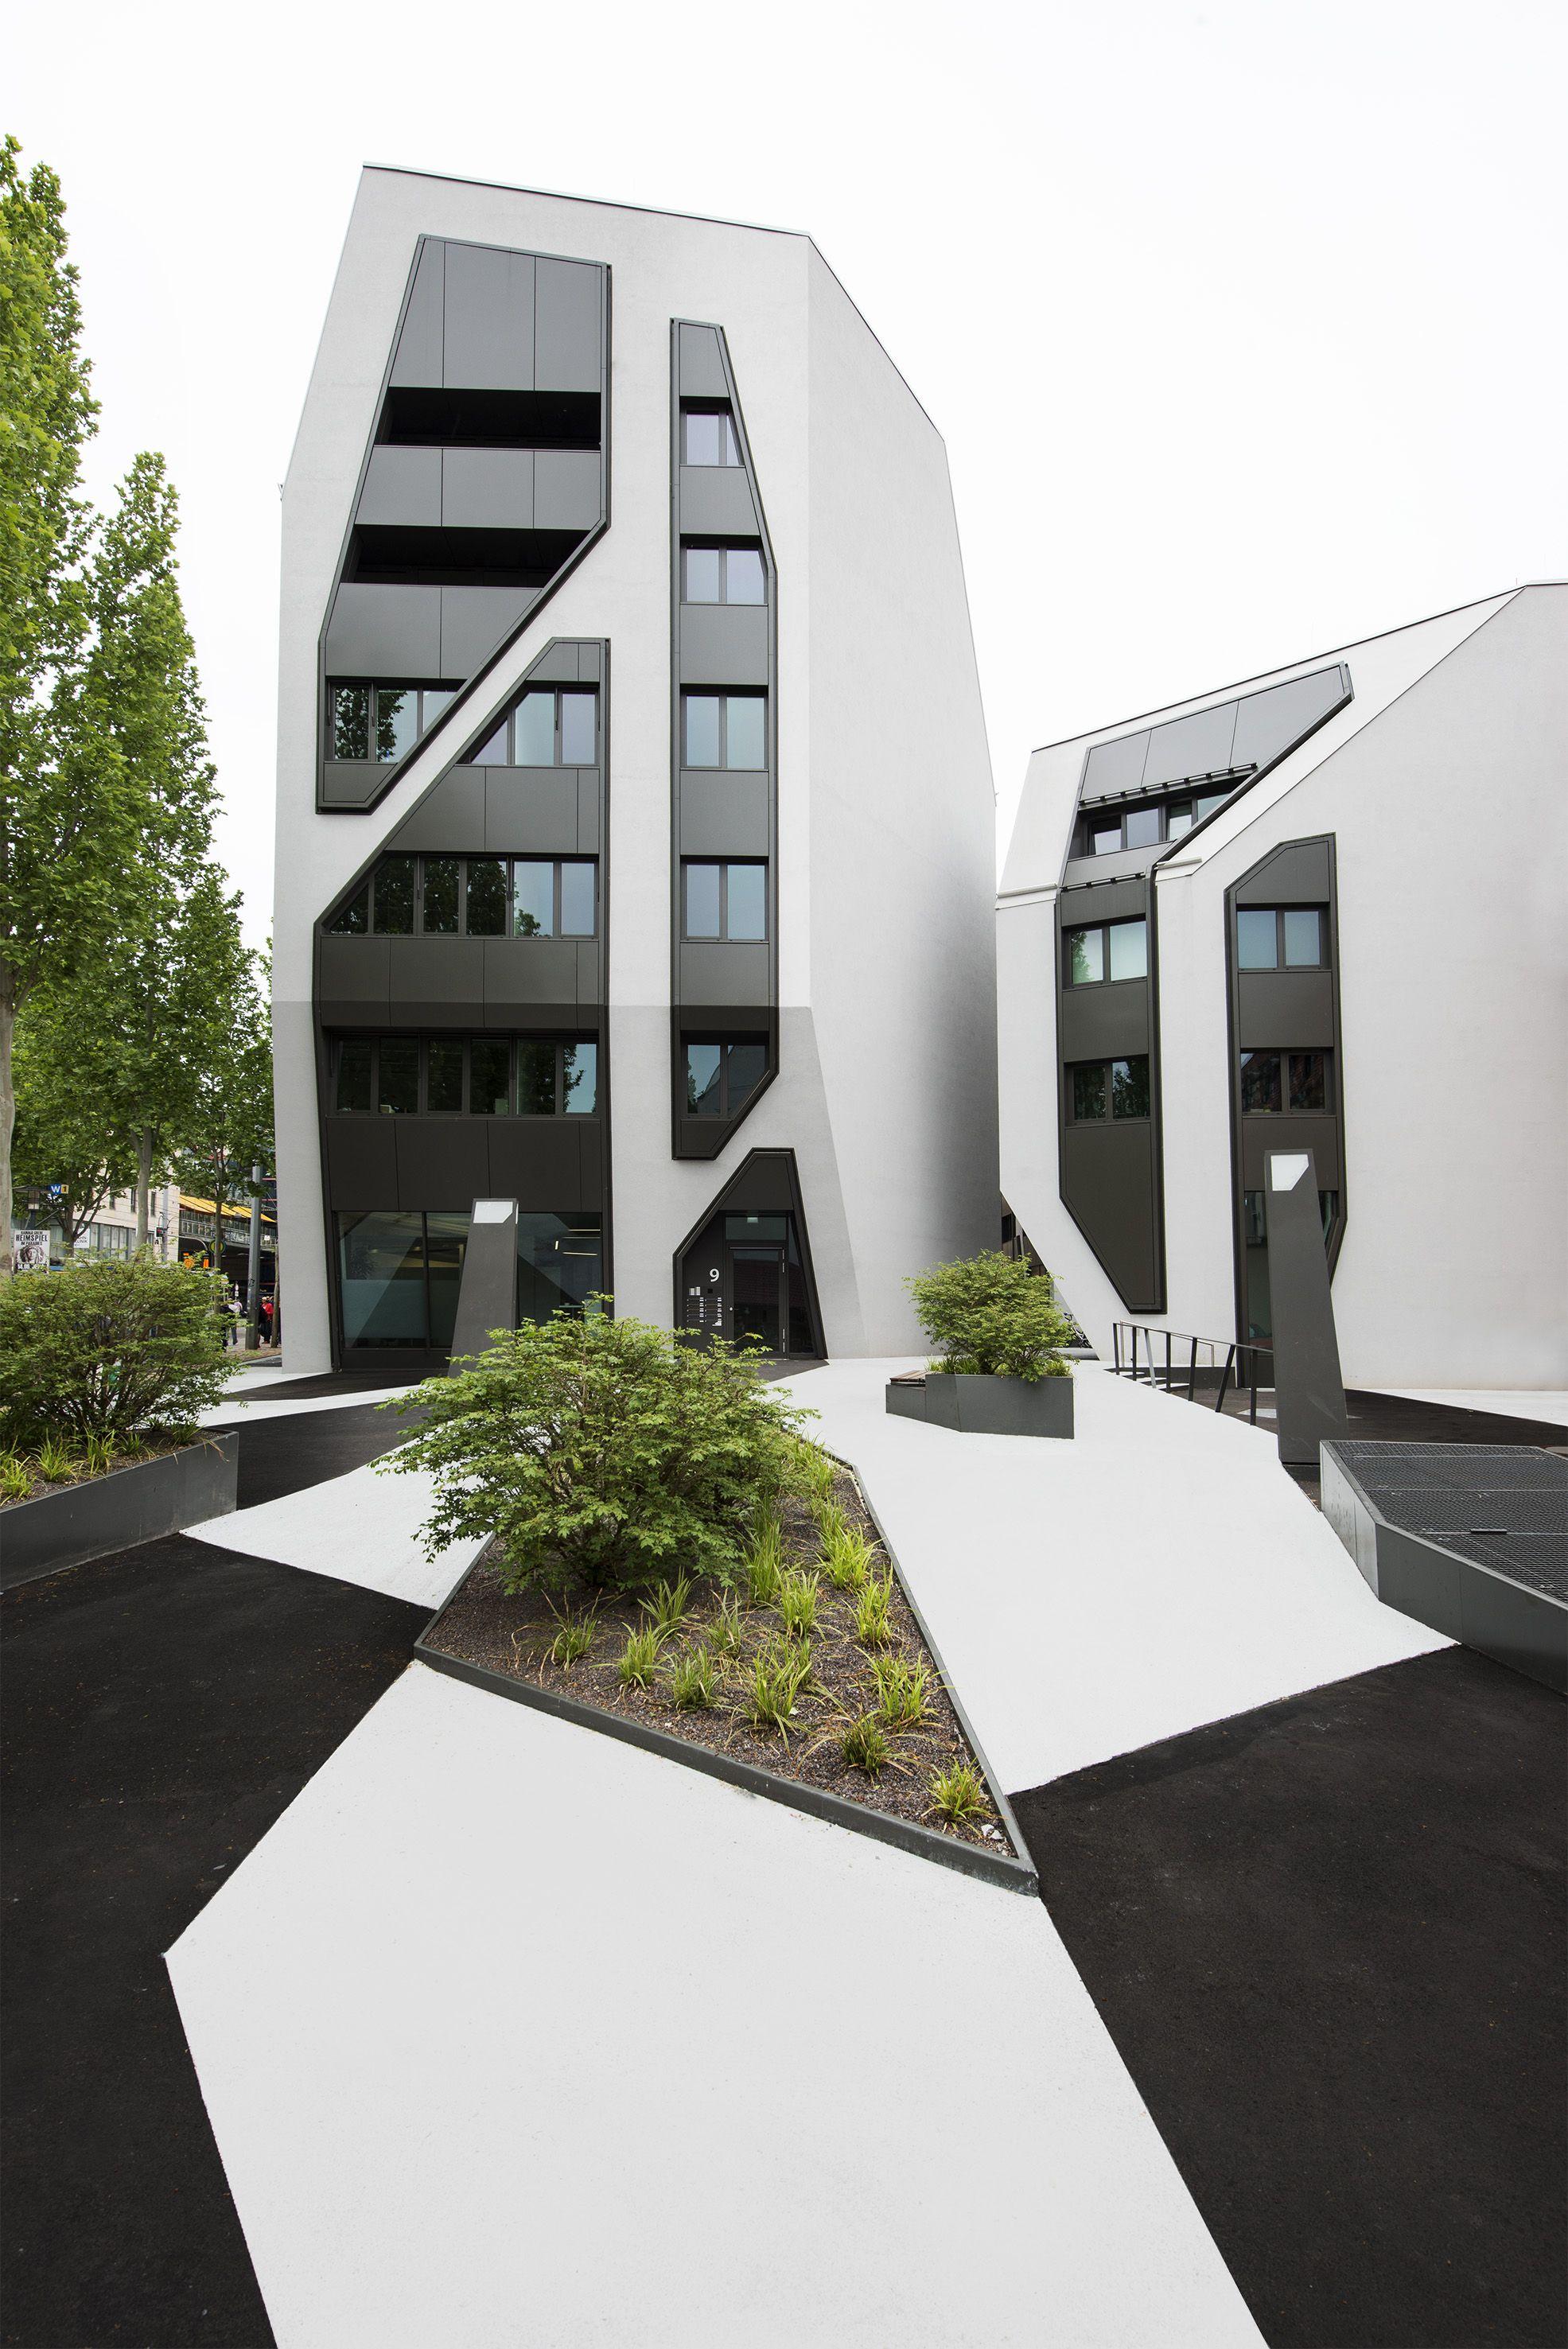 Architekten Jena jürgen mayer hermann architekten sonnenhof jena fold line